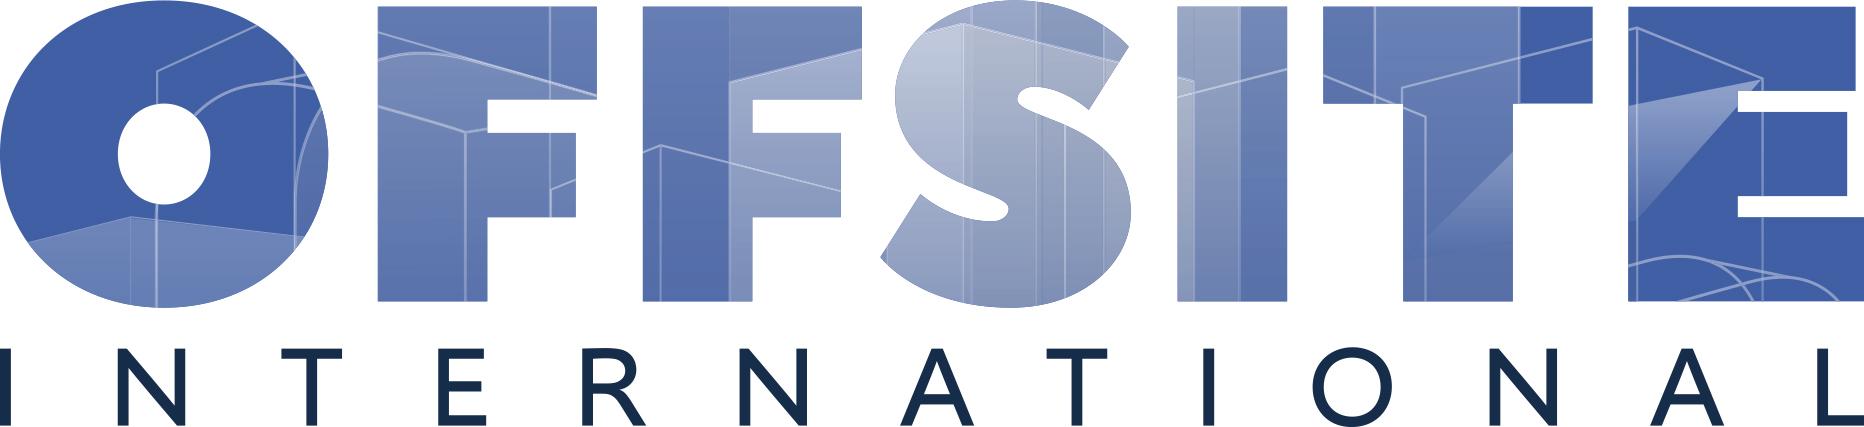 Offsite-logo-prefab-vakbeurs-bouw